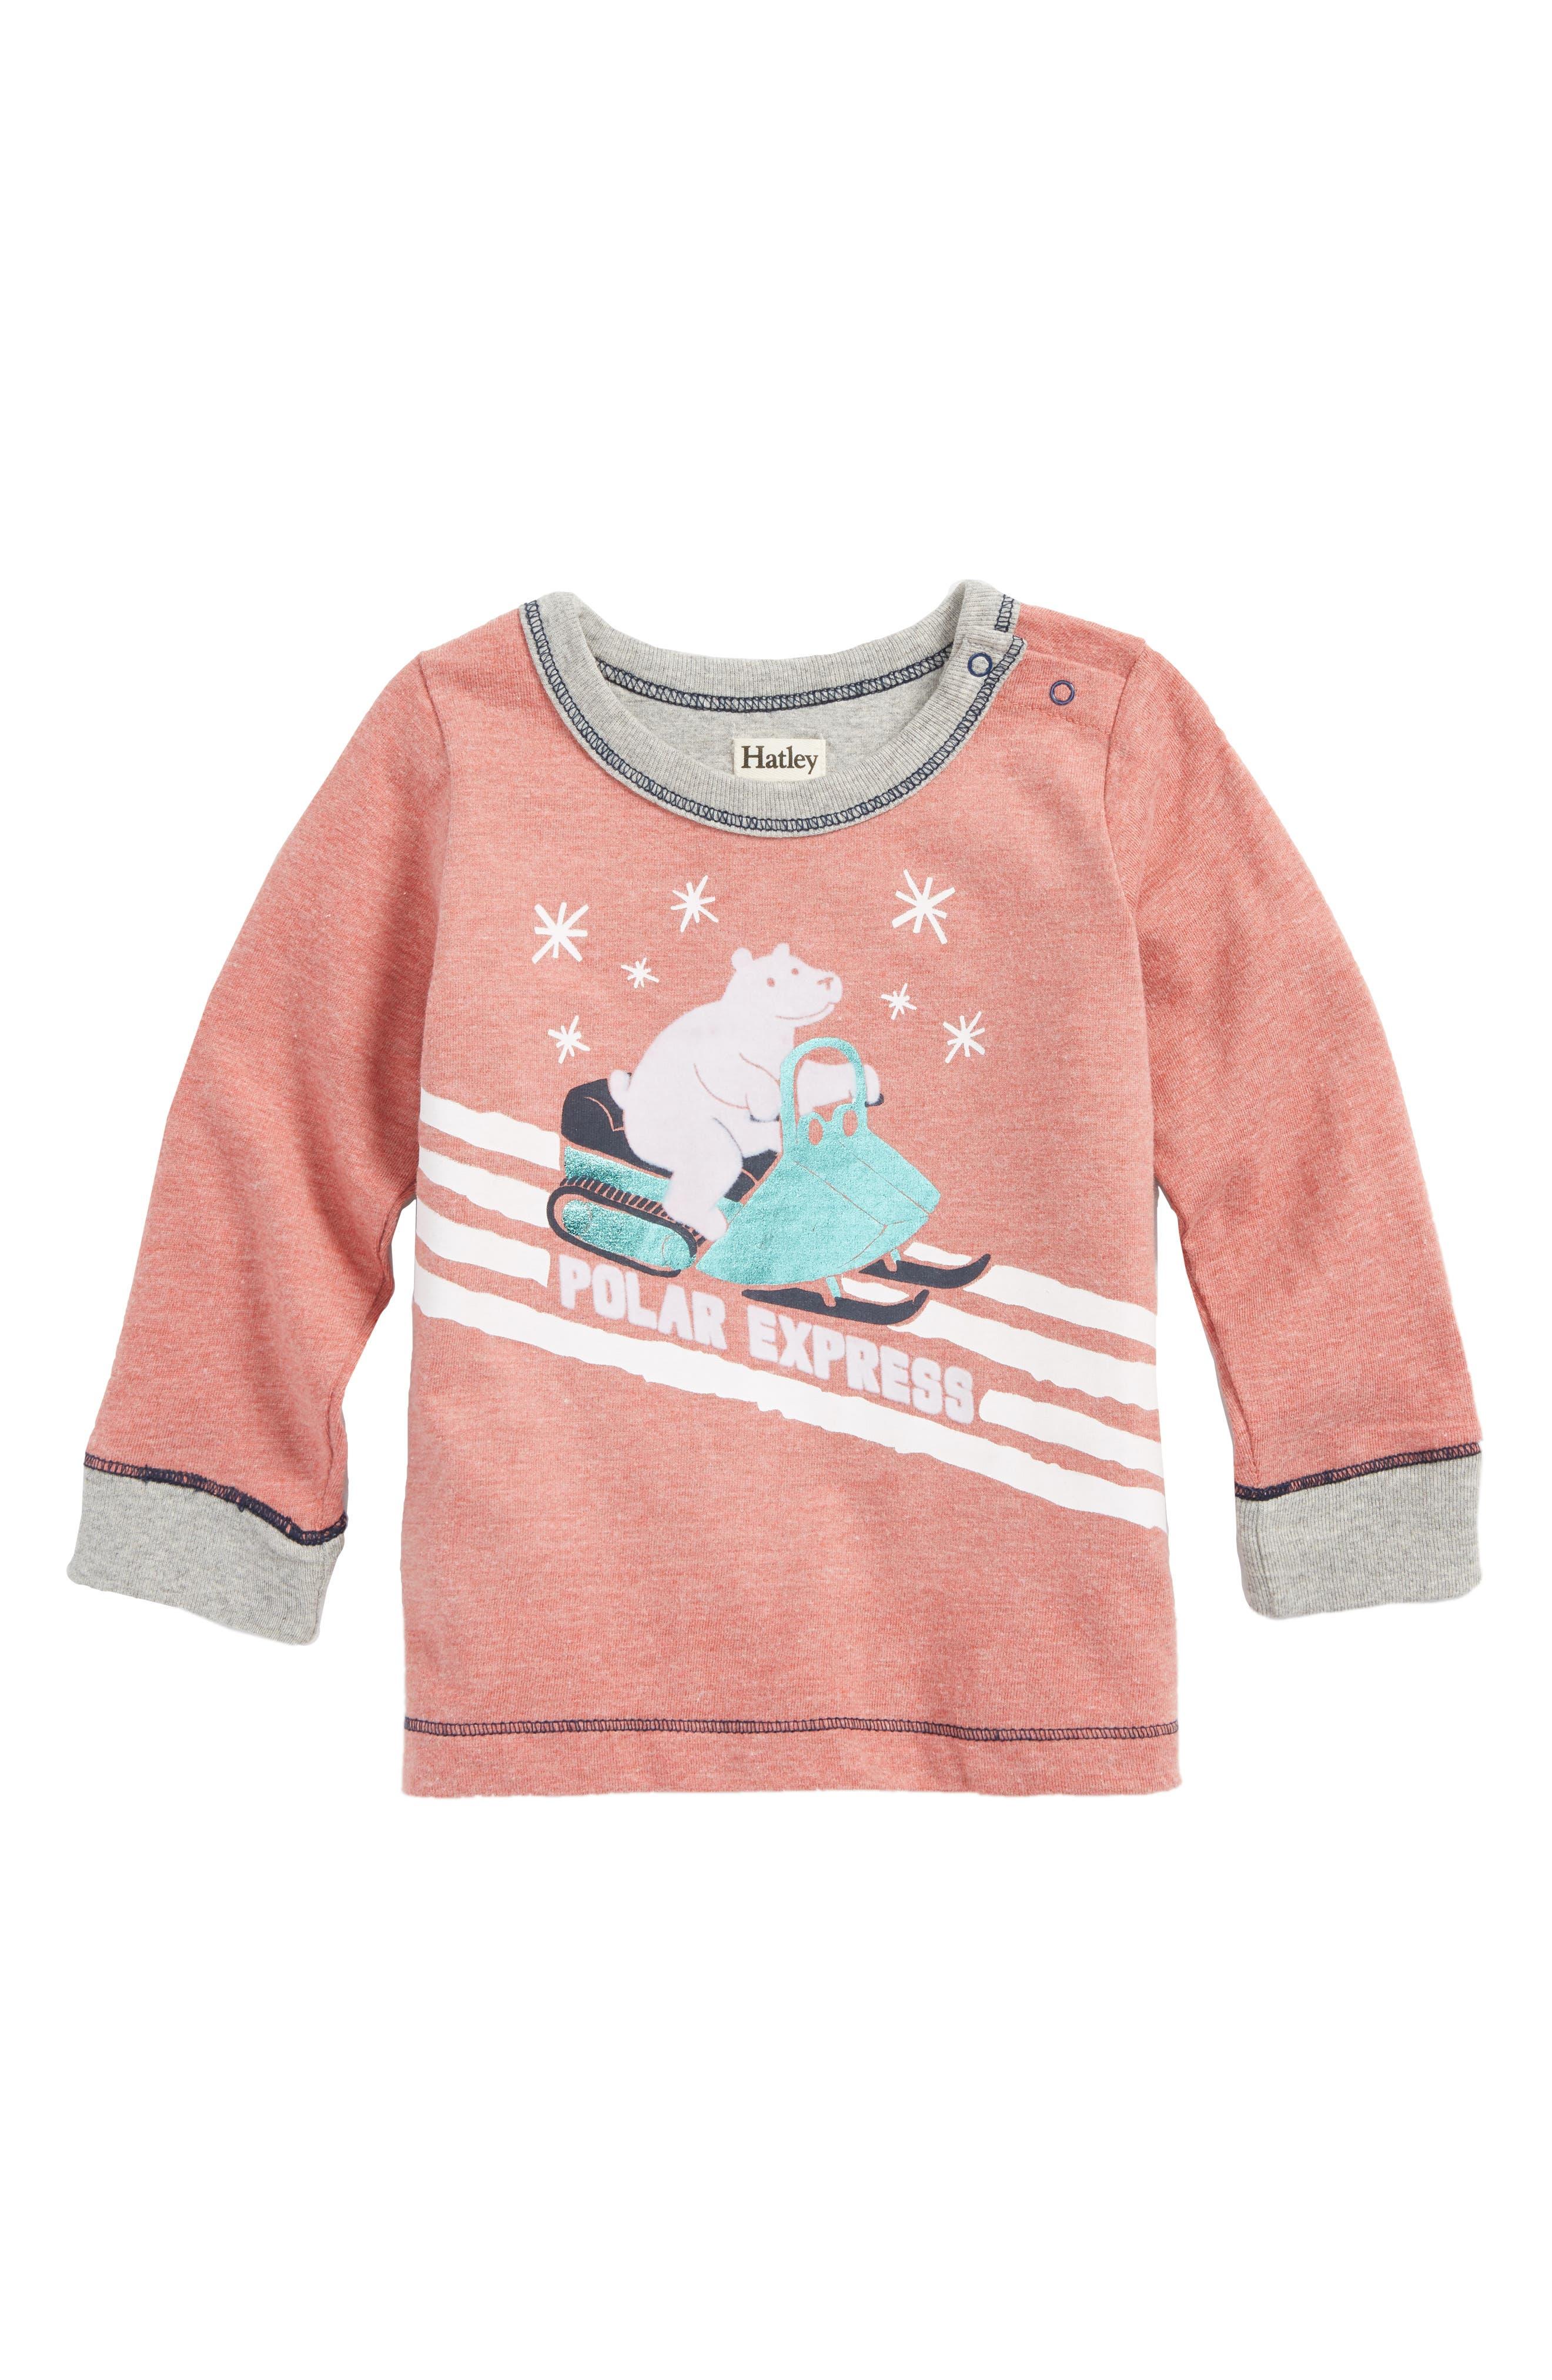 Hatley Polar Express Graphic T-Shirt (Baby Boys)